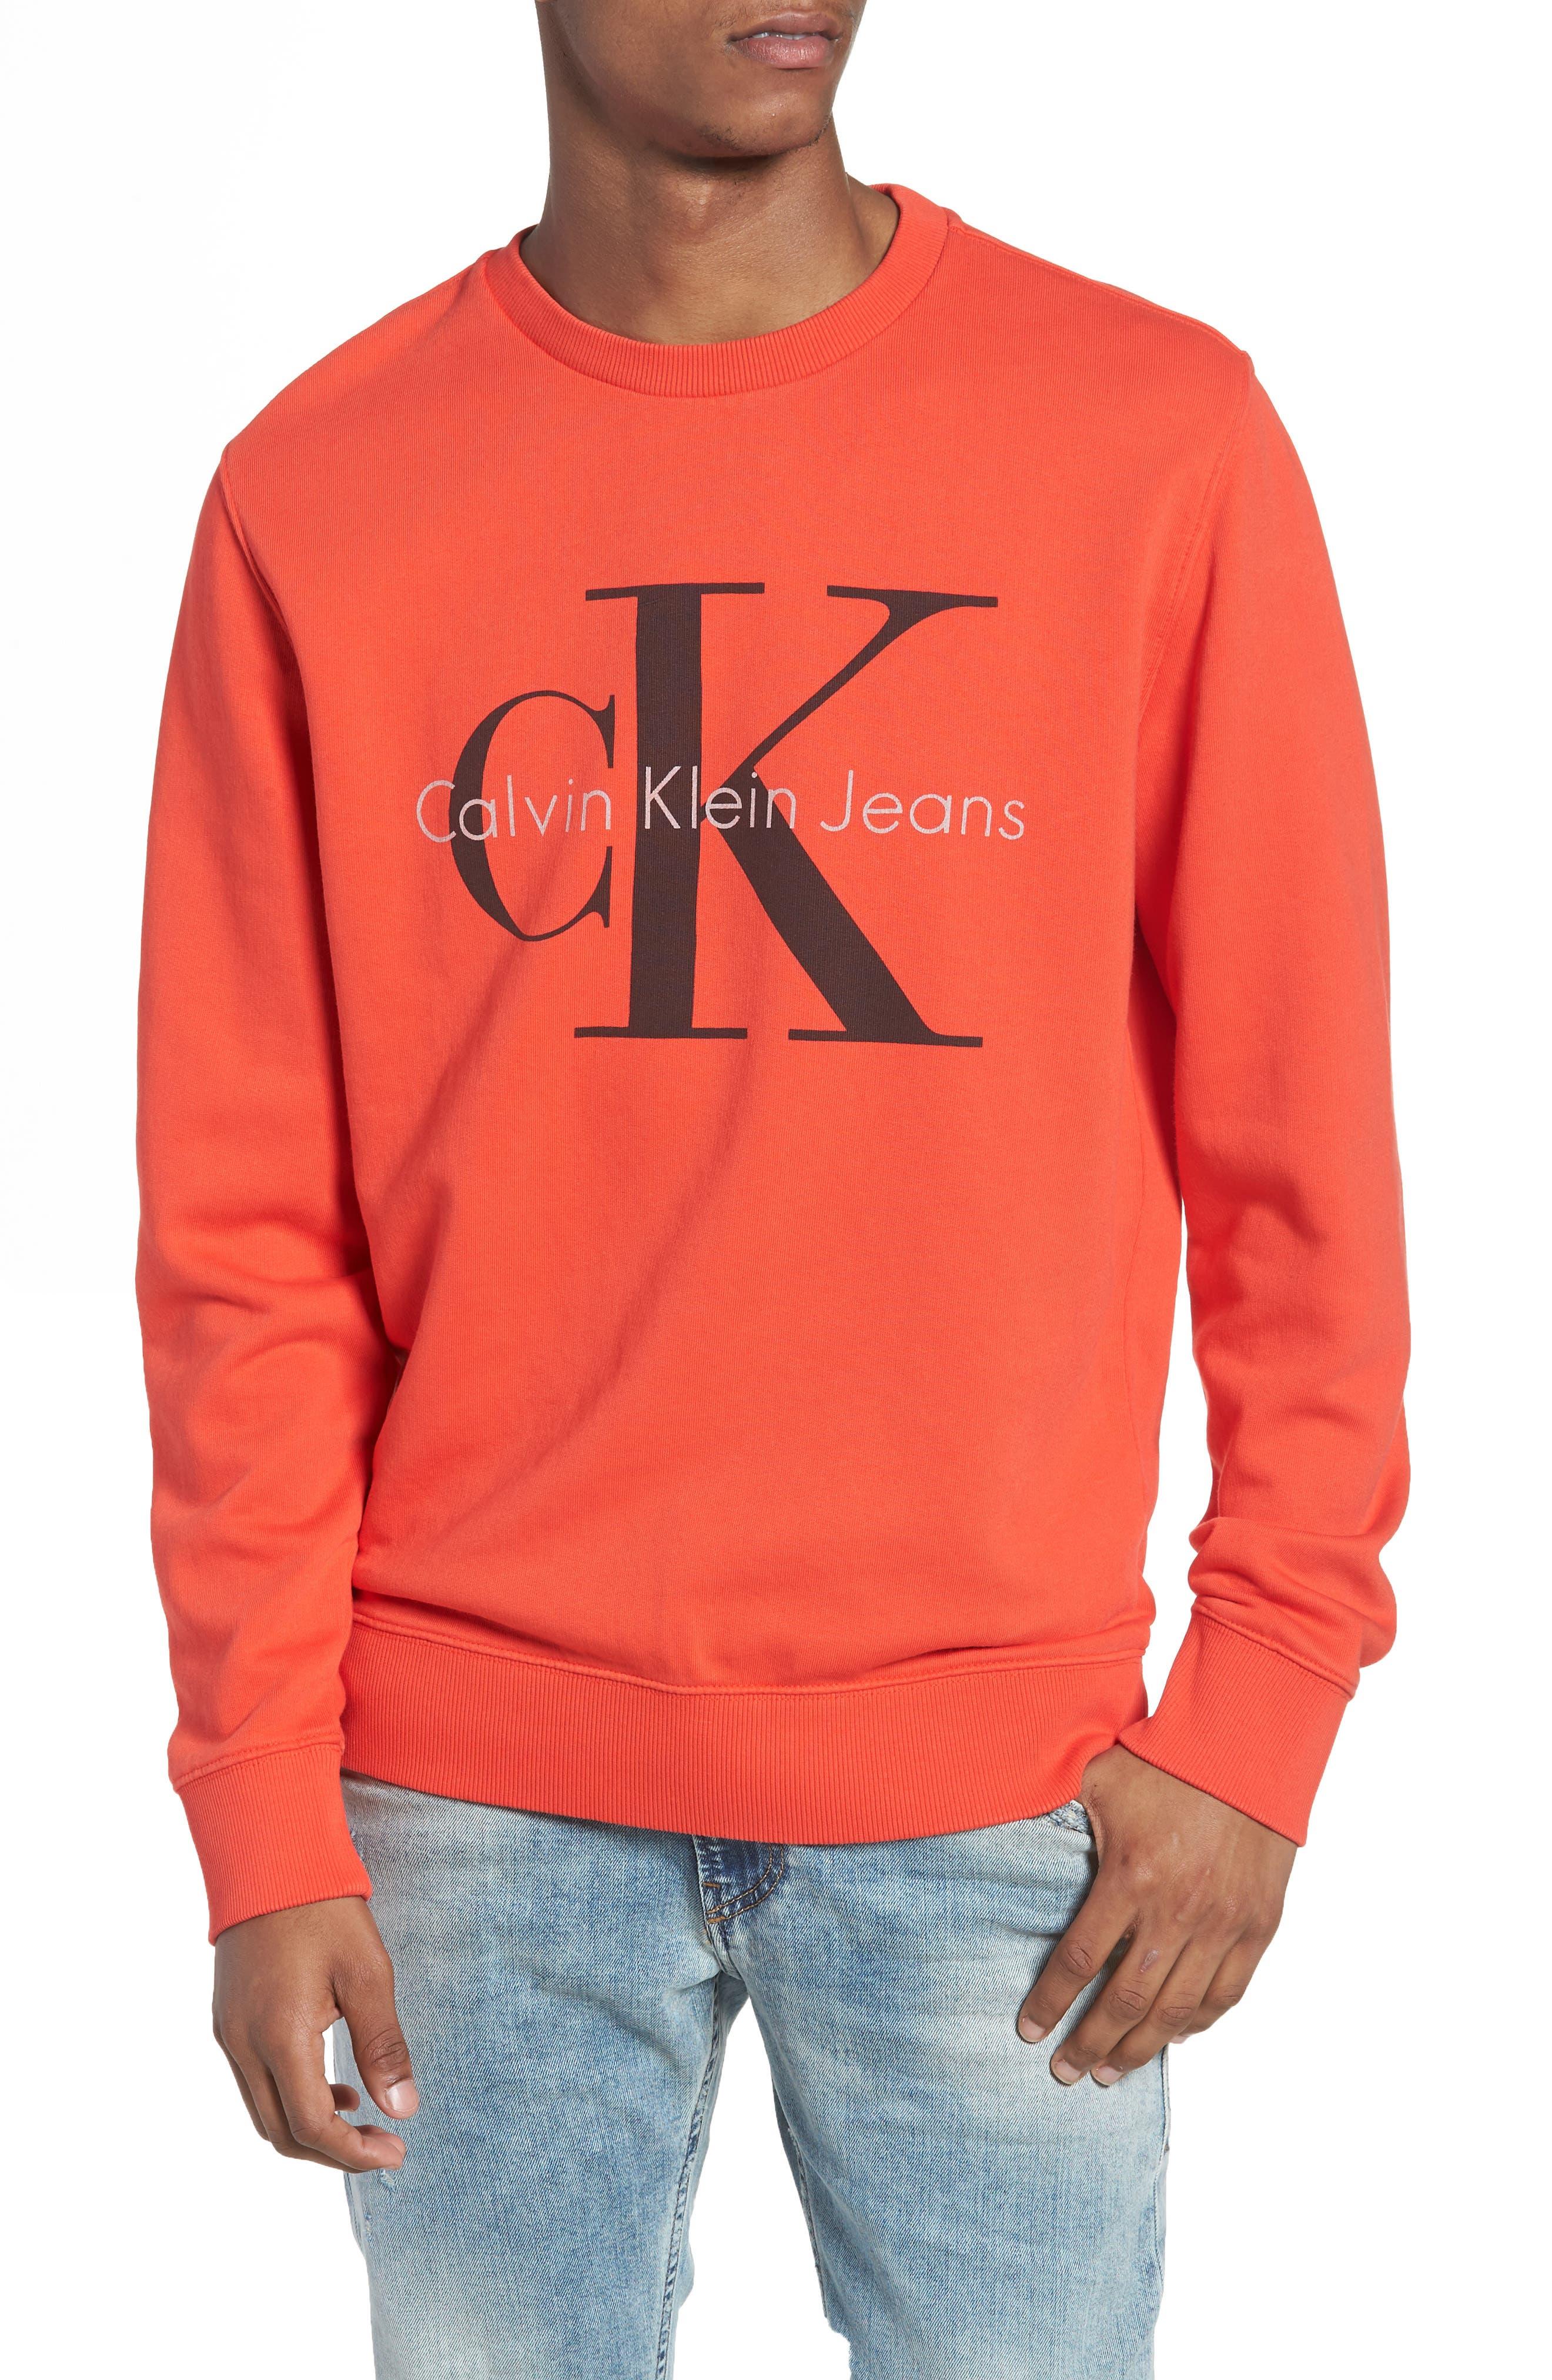 Calvin Klein Jeans Pop Color Sweatshirt